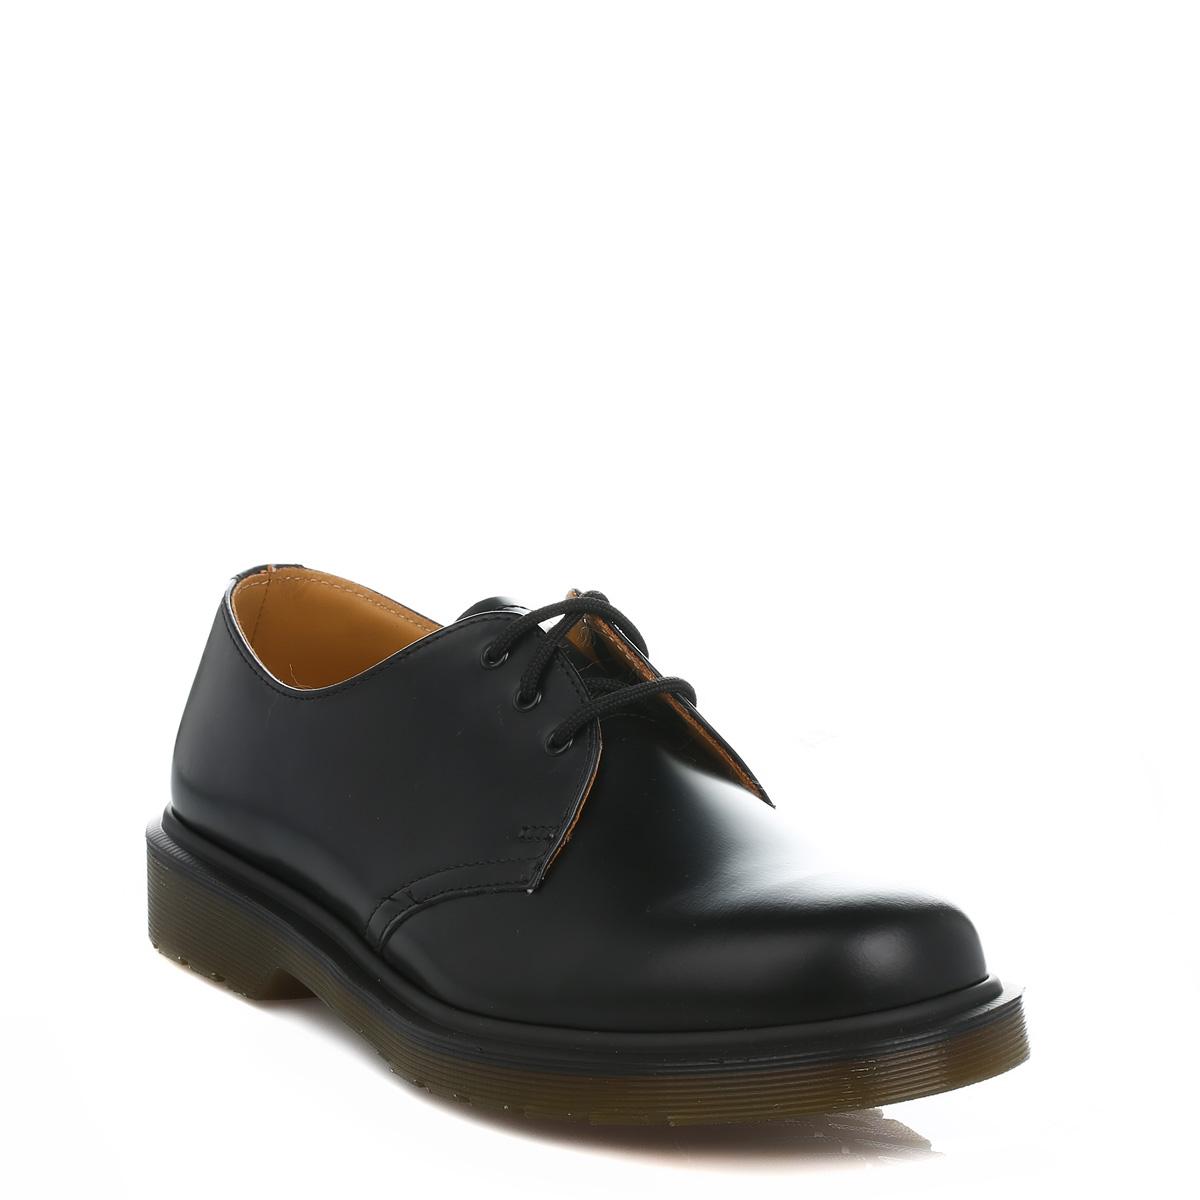 Dr. Martens Unisex Mens Damenschuhe Docs schwarz 1461 Smooth Leder Smart Casual Schuhes